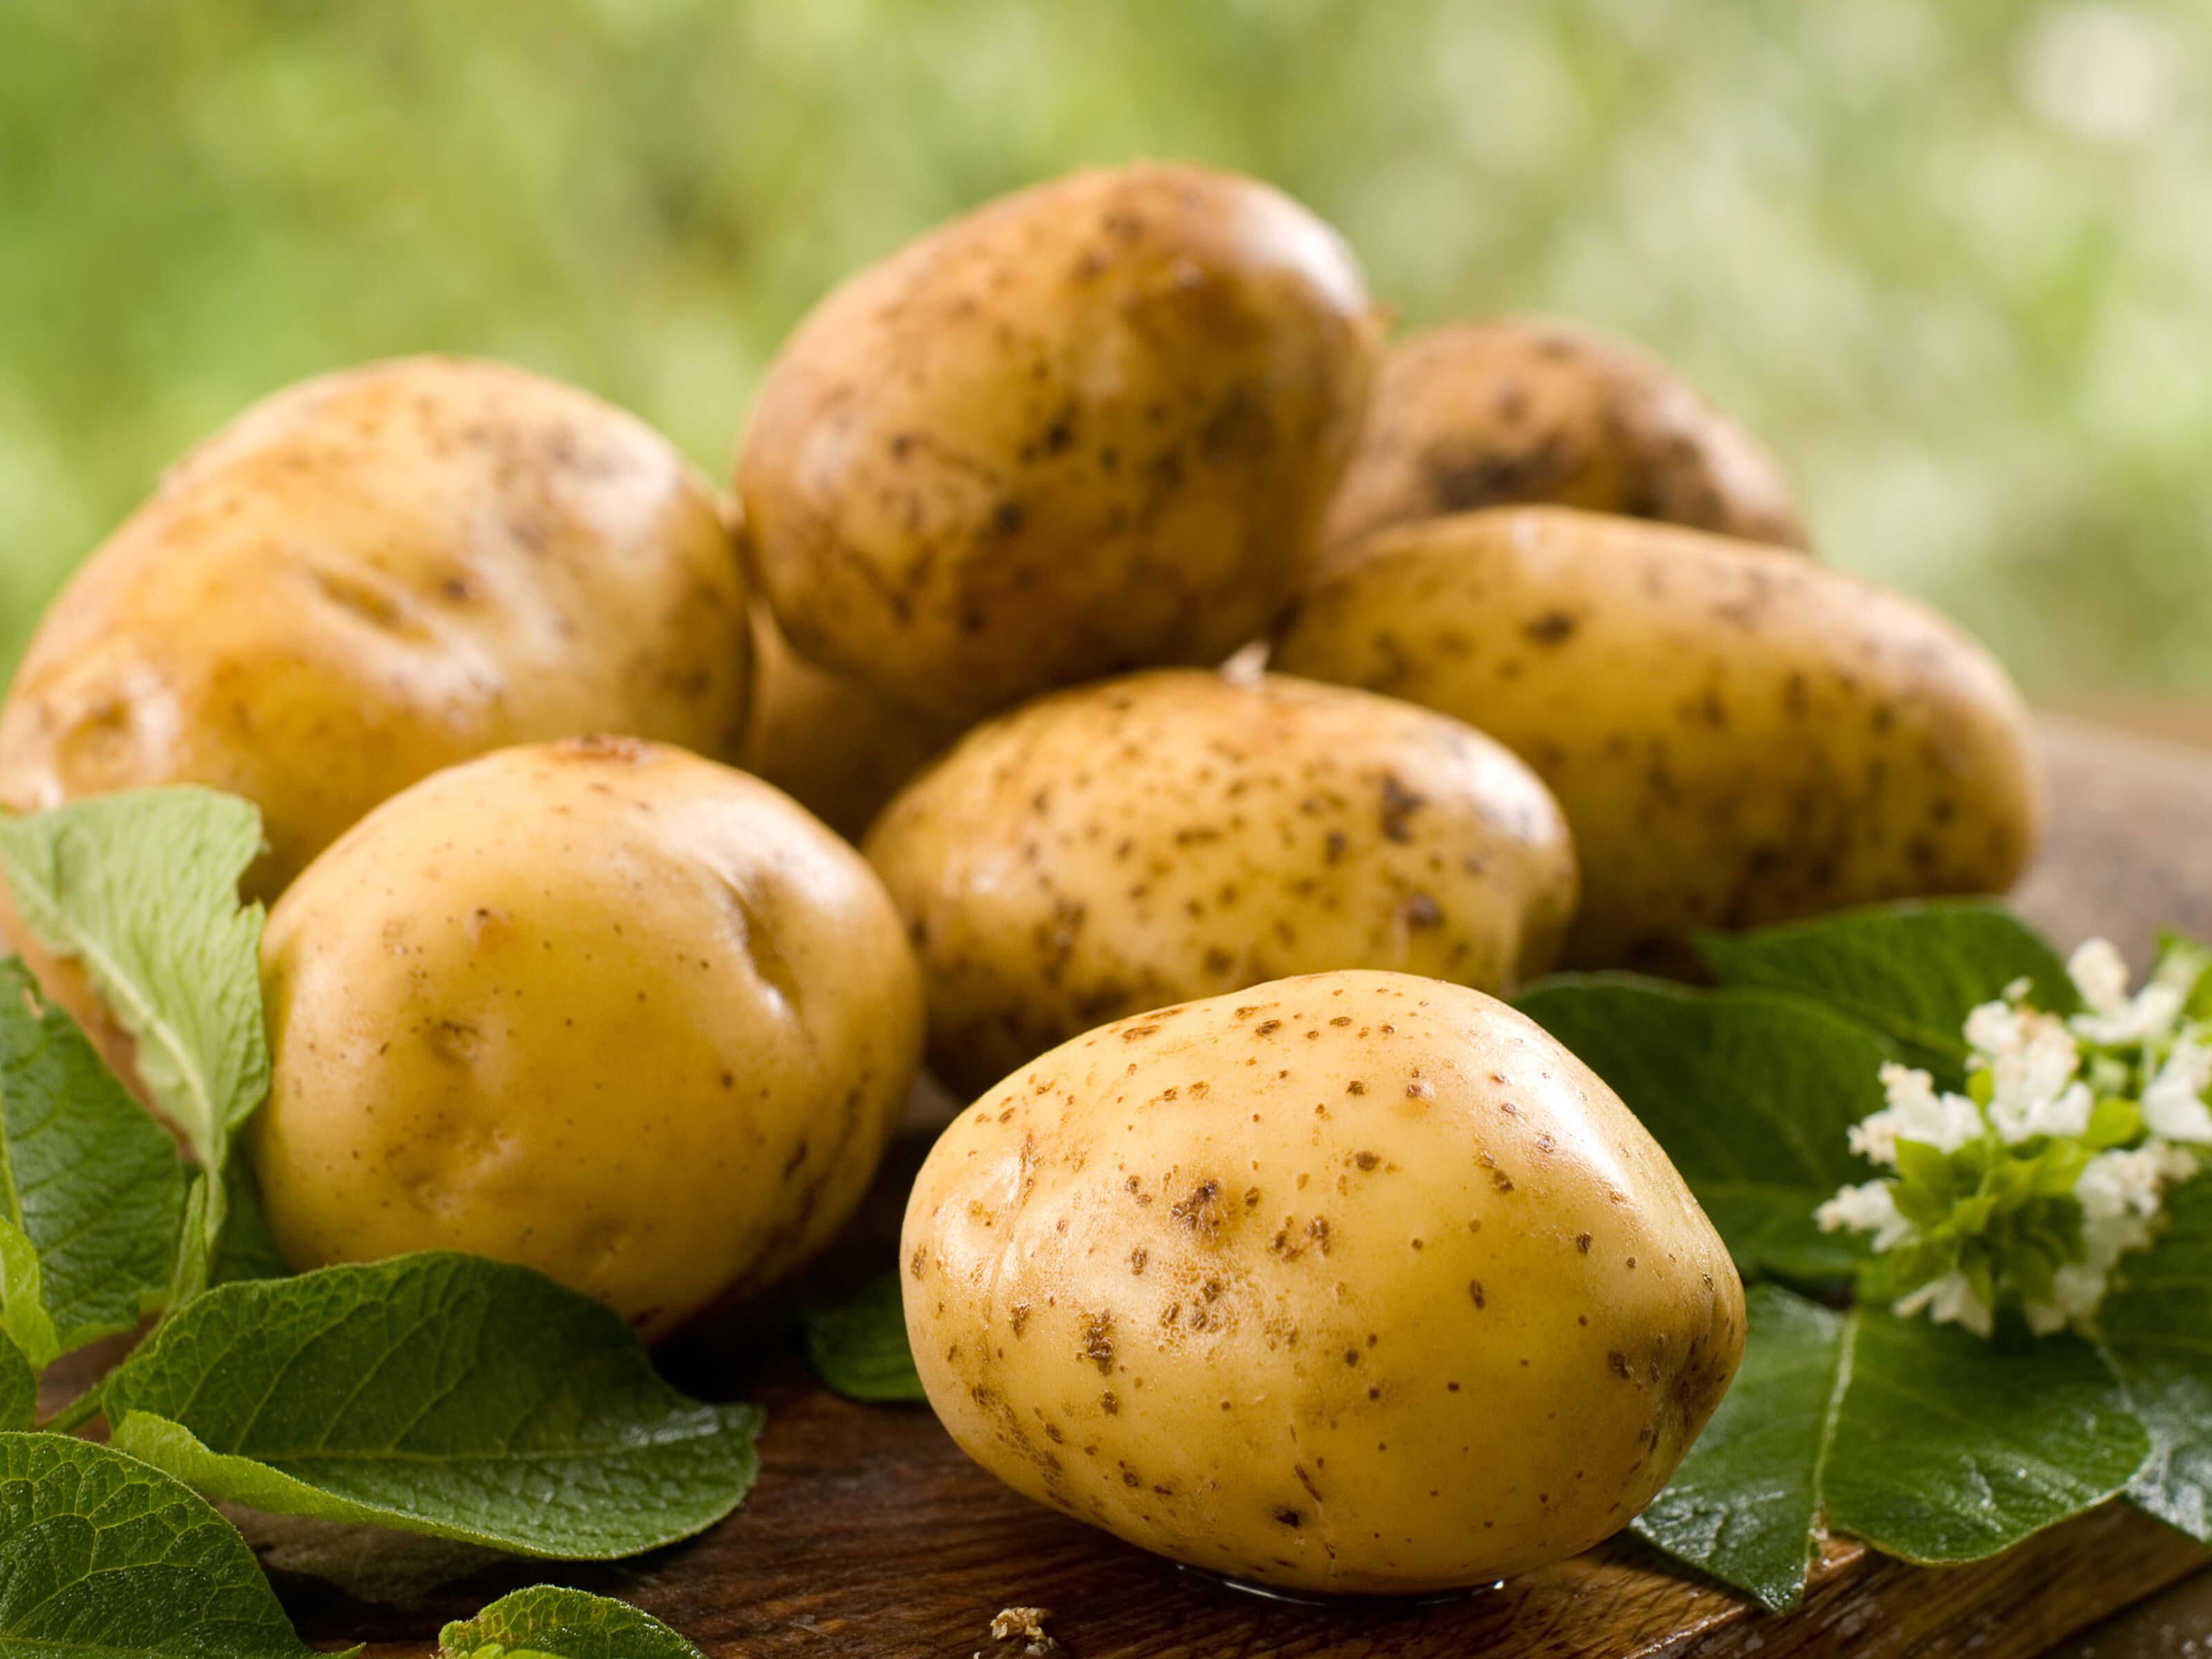 Quality potatoes